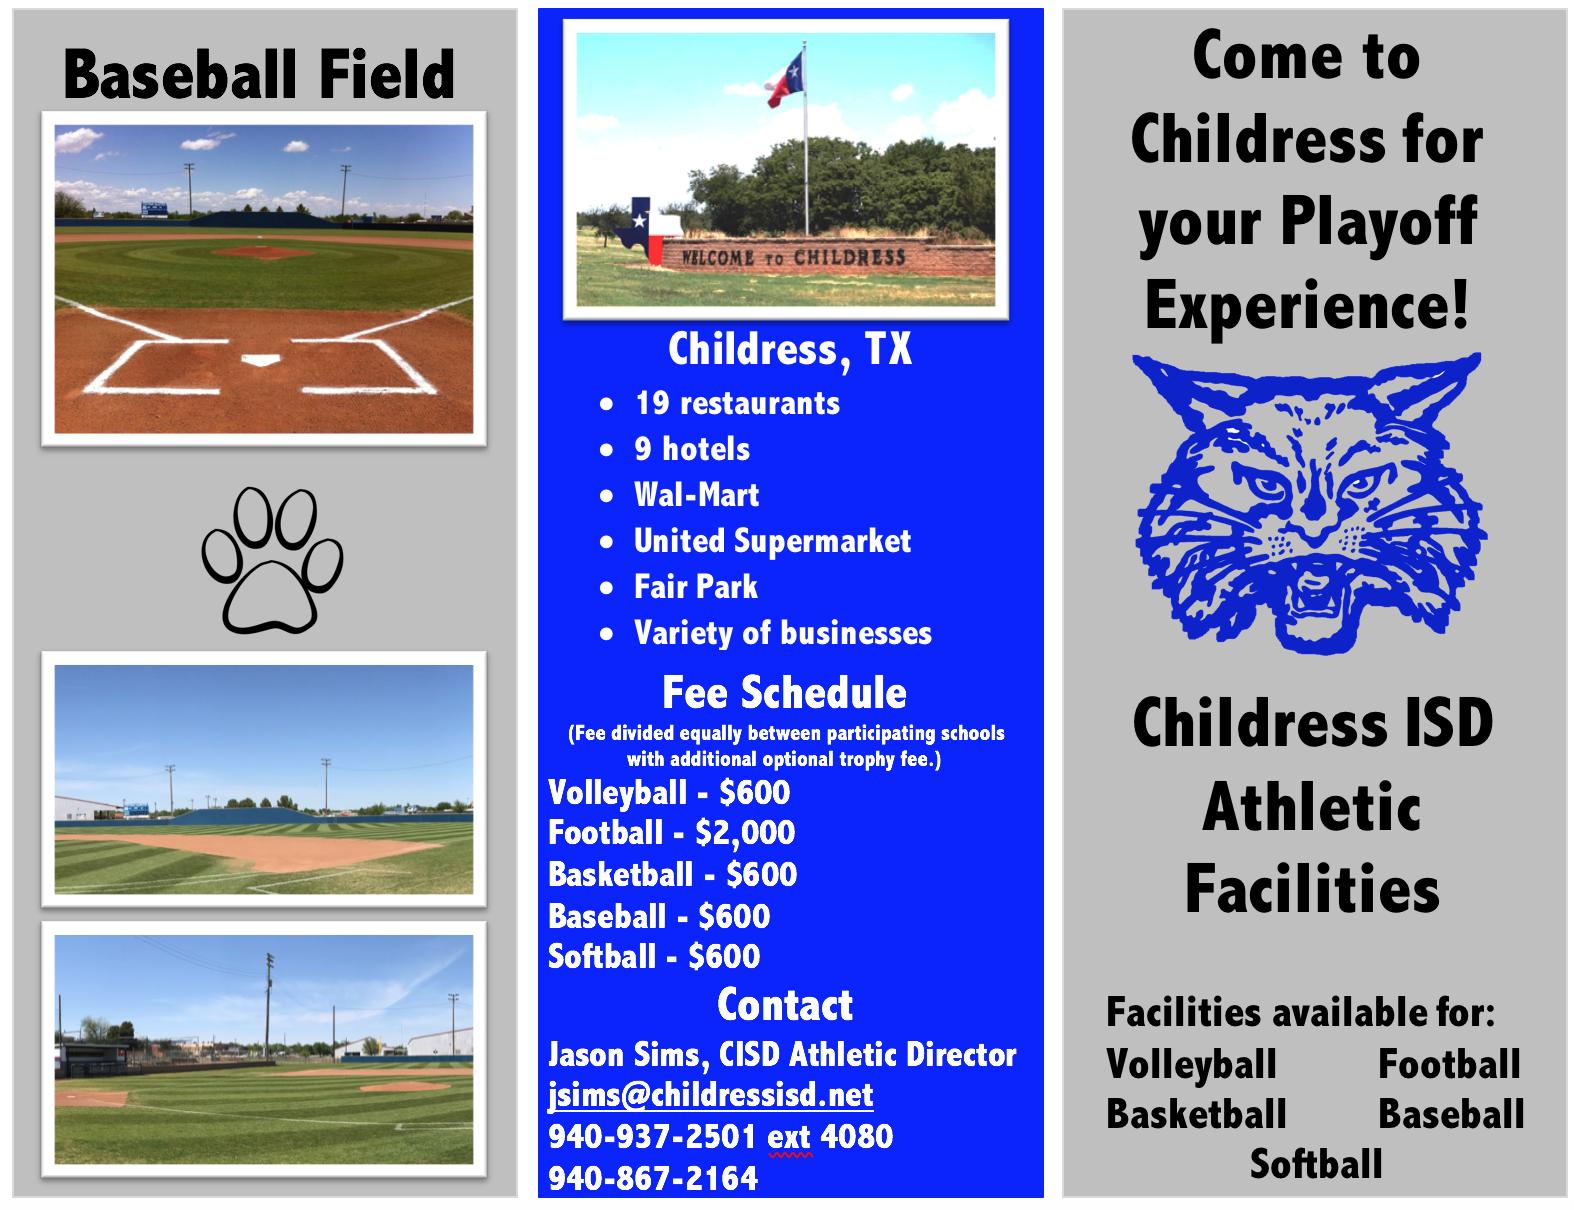 Athletic Facilities information